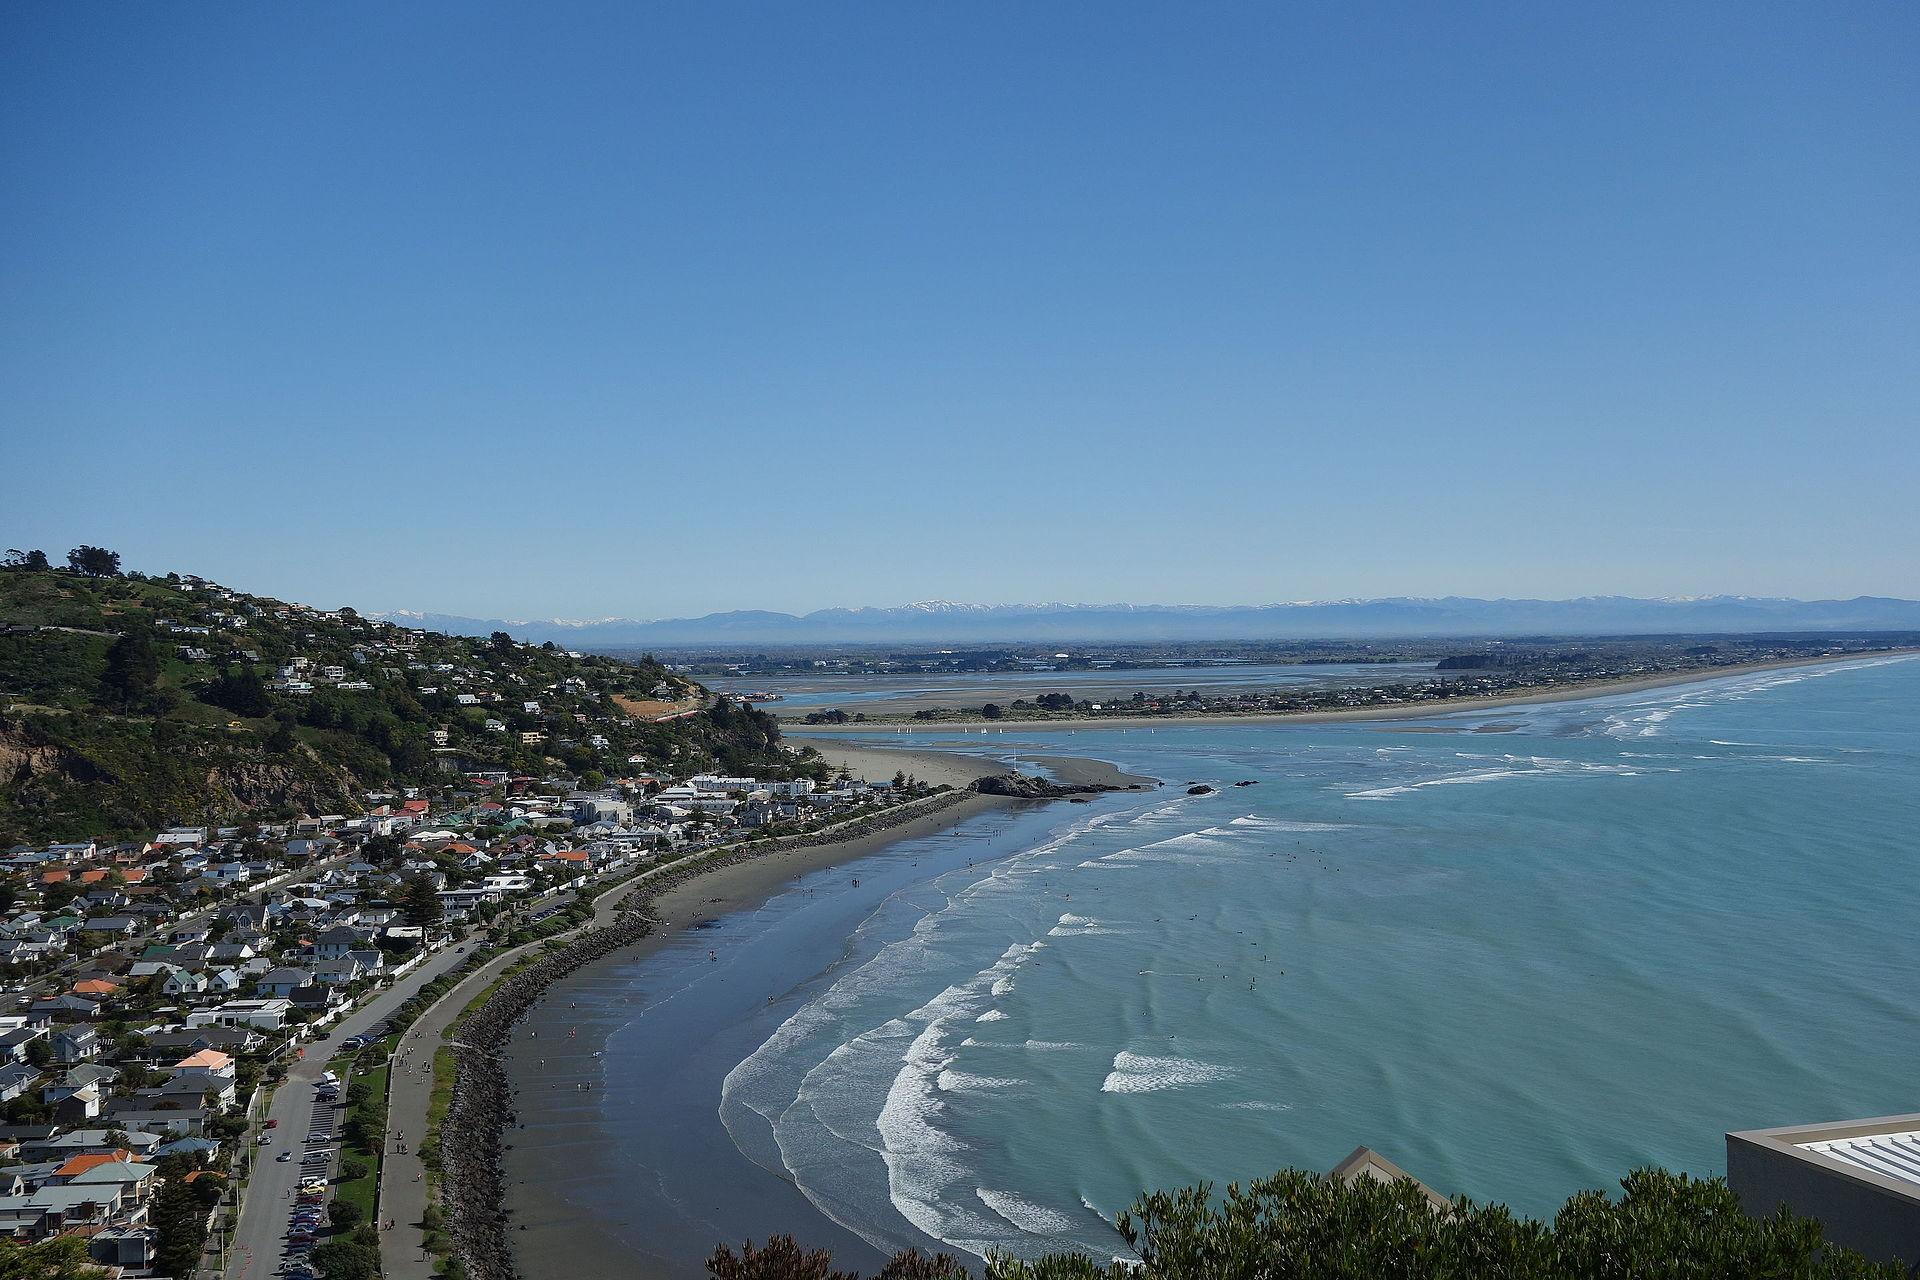 Sumner New Zealand  Wikipedia